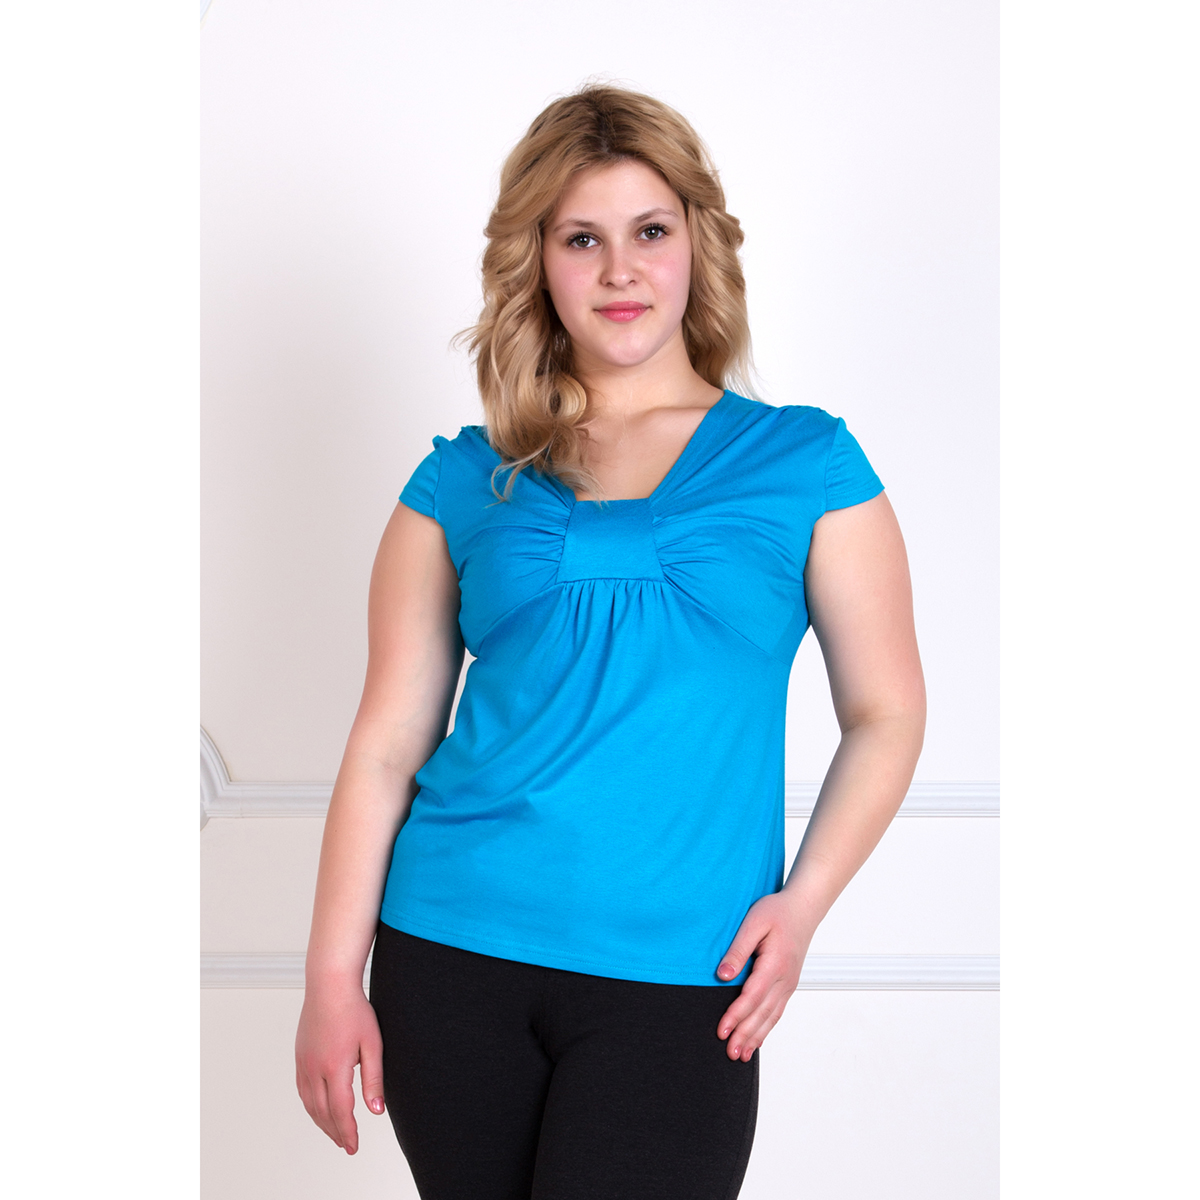 Женская блуза Романтика Голубой, размер 48Блузы<br>Обхват груди: 96 см <br>Обхват талии: 78 см <br>Обхват бедер: 104 см <br>Рост: 167 см<br><br>Тип: Жен. блуза<br>Размер: 48<br>Материал: Вискоза